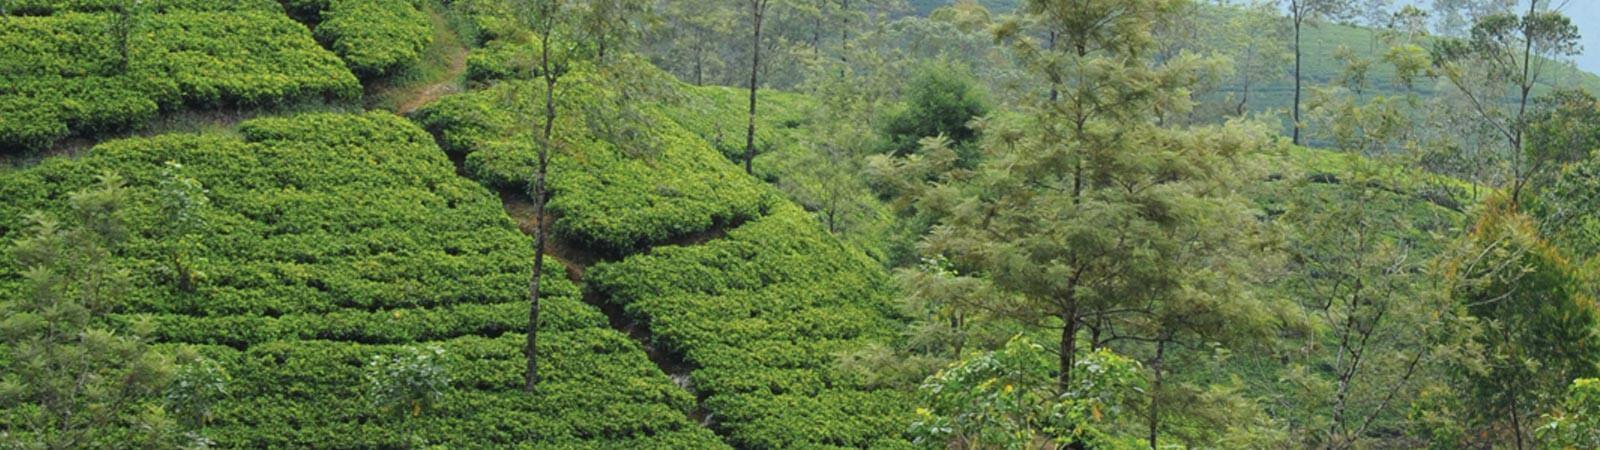 Tea production in Sri Lanka